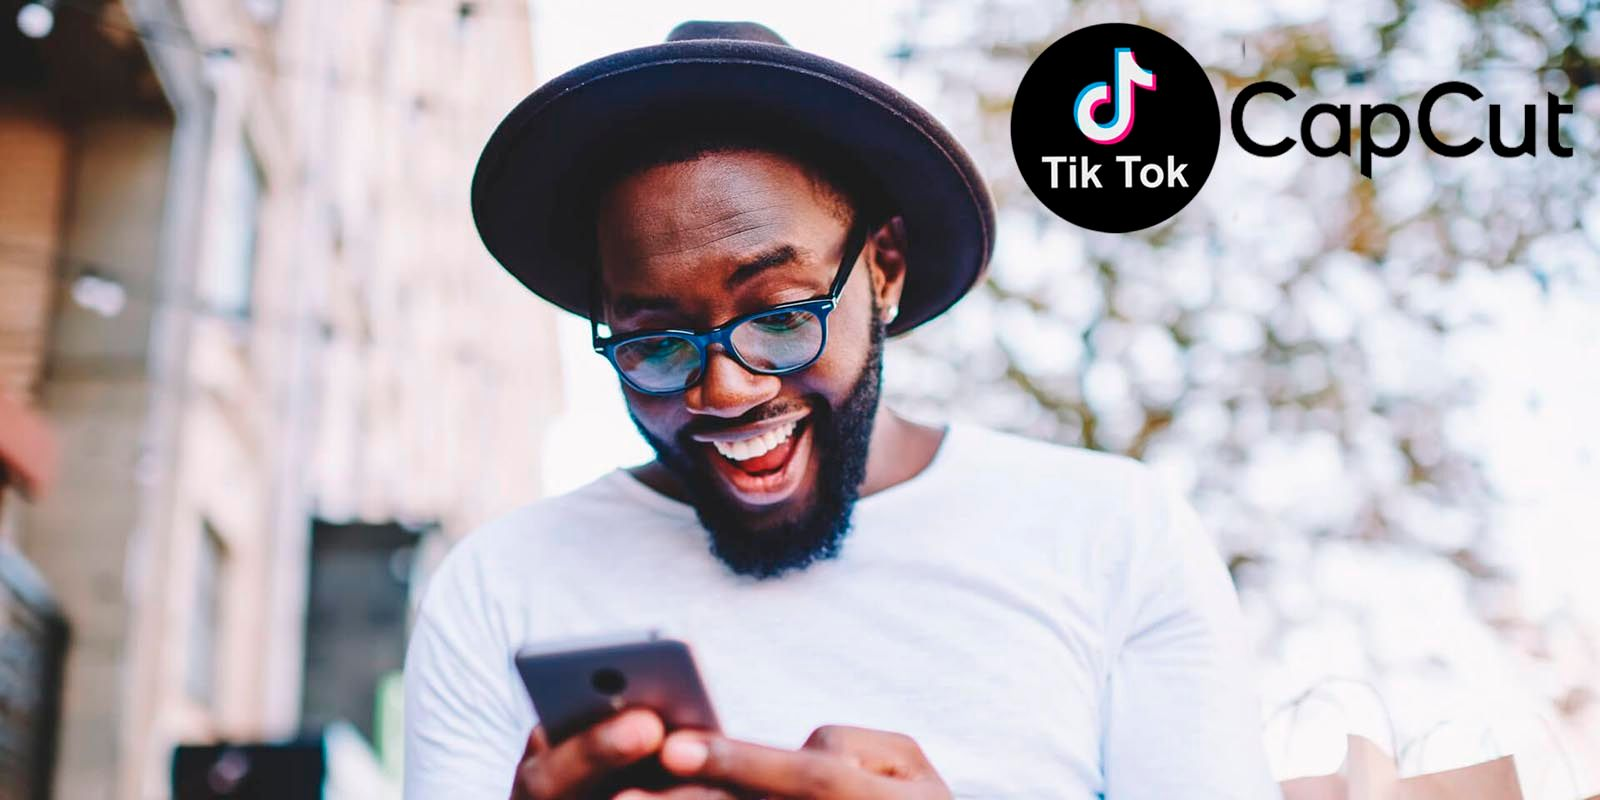 Subir videos desde CapCut a TikTok aumenta alcance